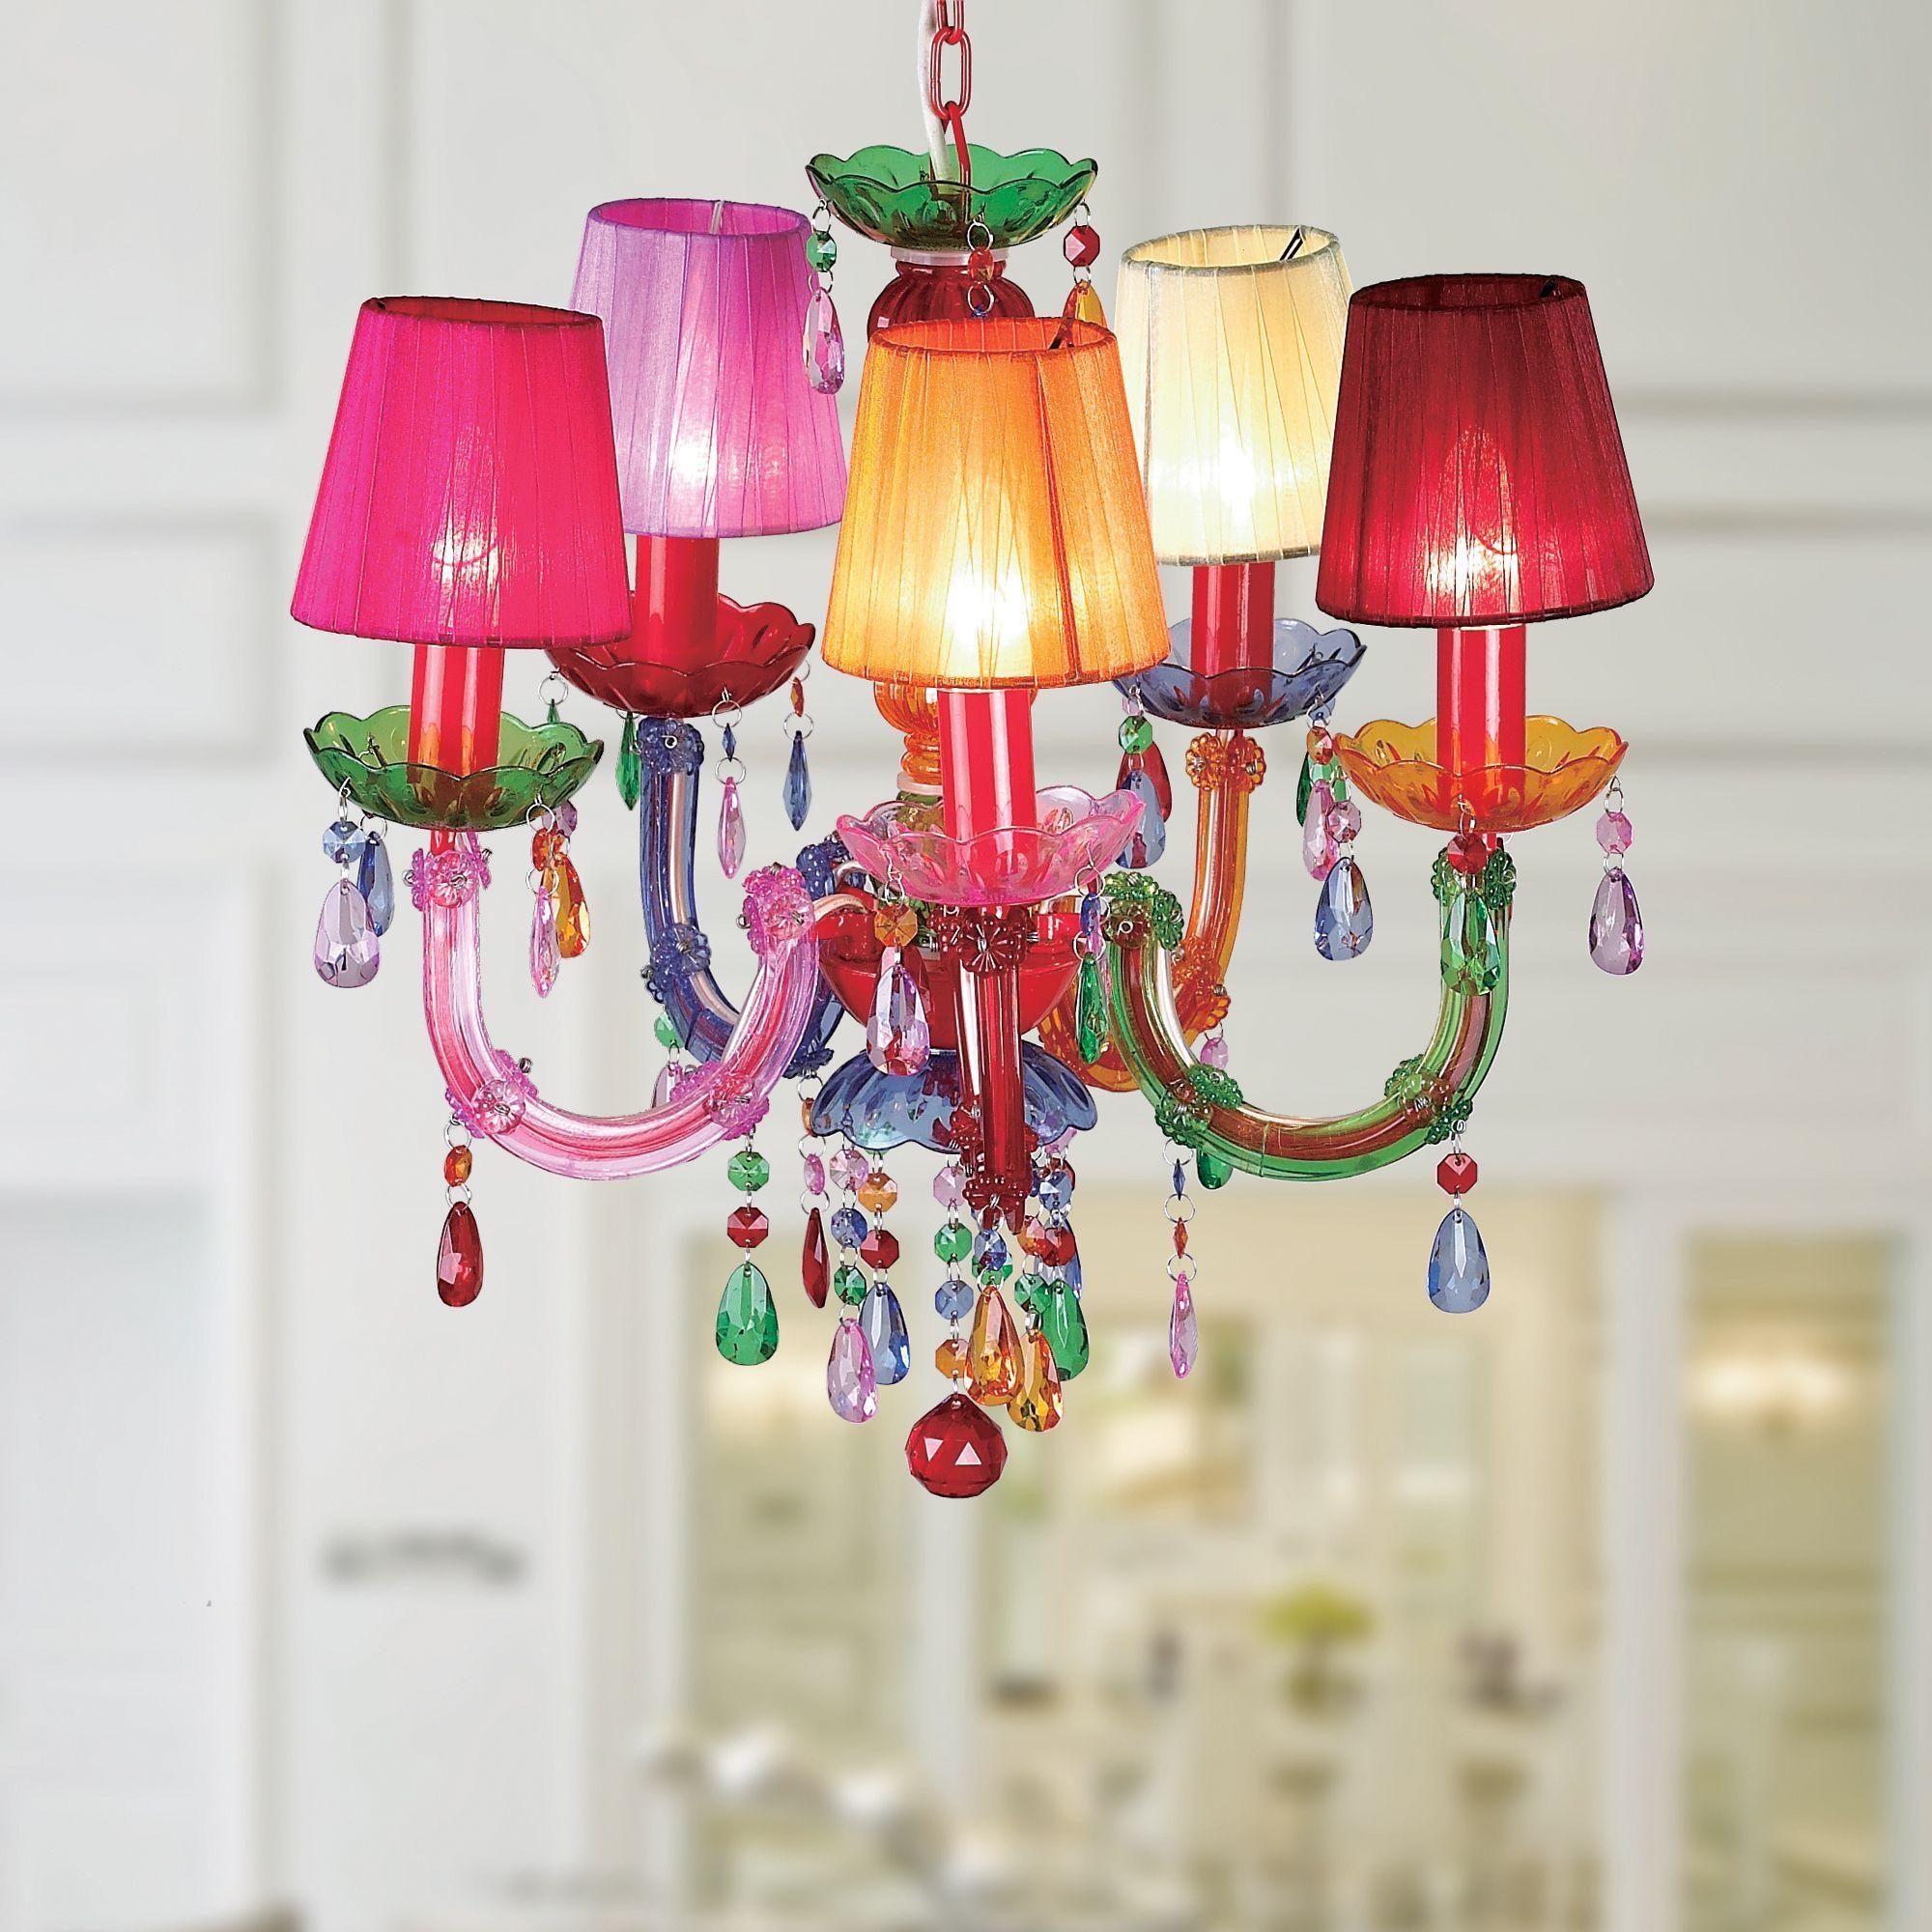 Warehouse of Tiffany Eabha 5 light Multi colored 36 inch Acrylic